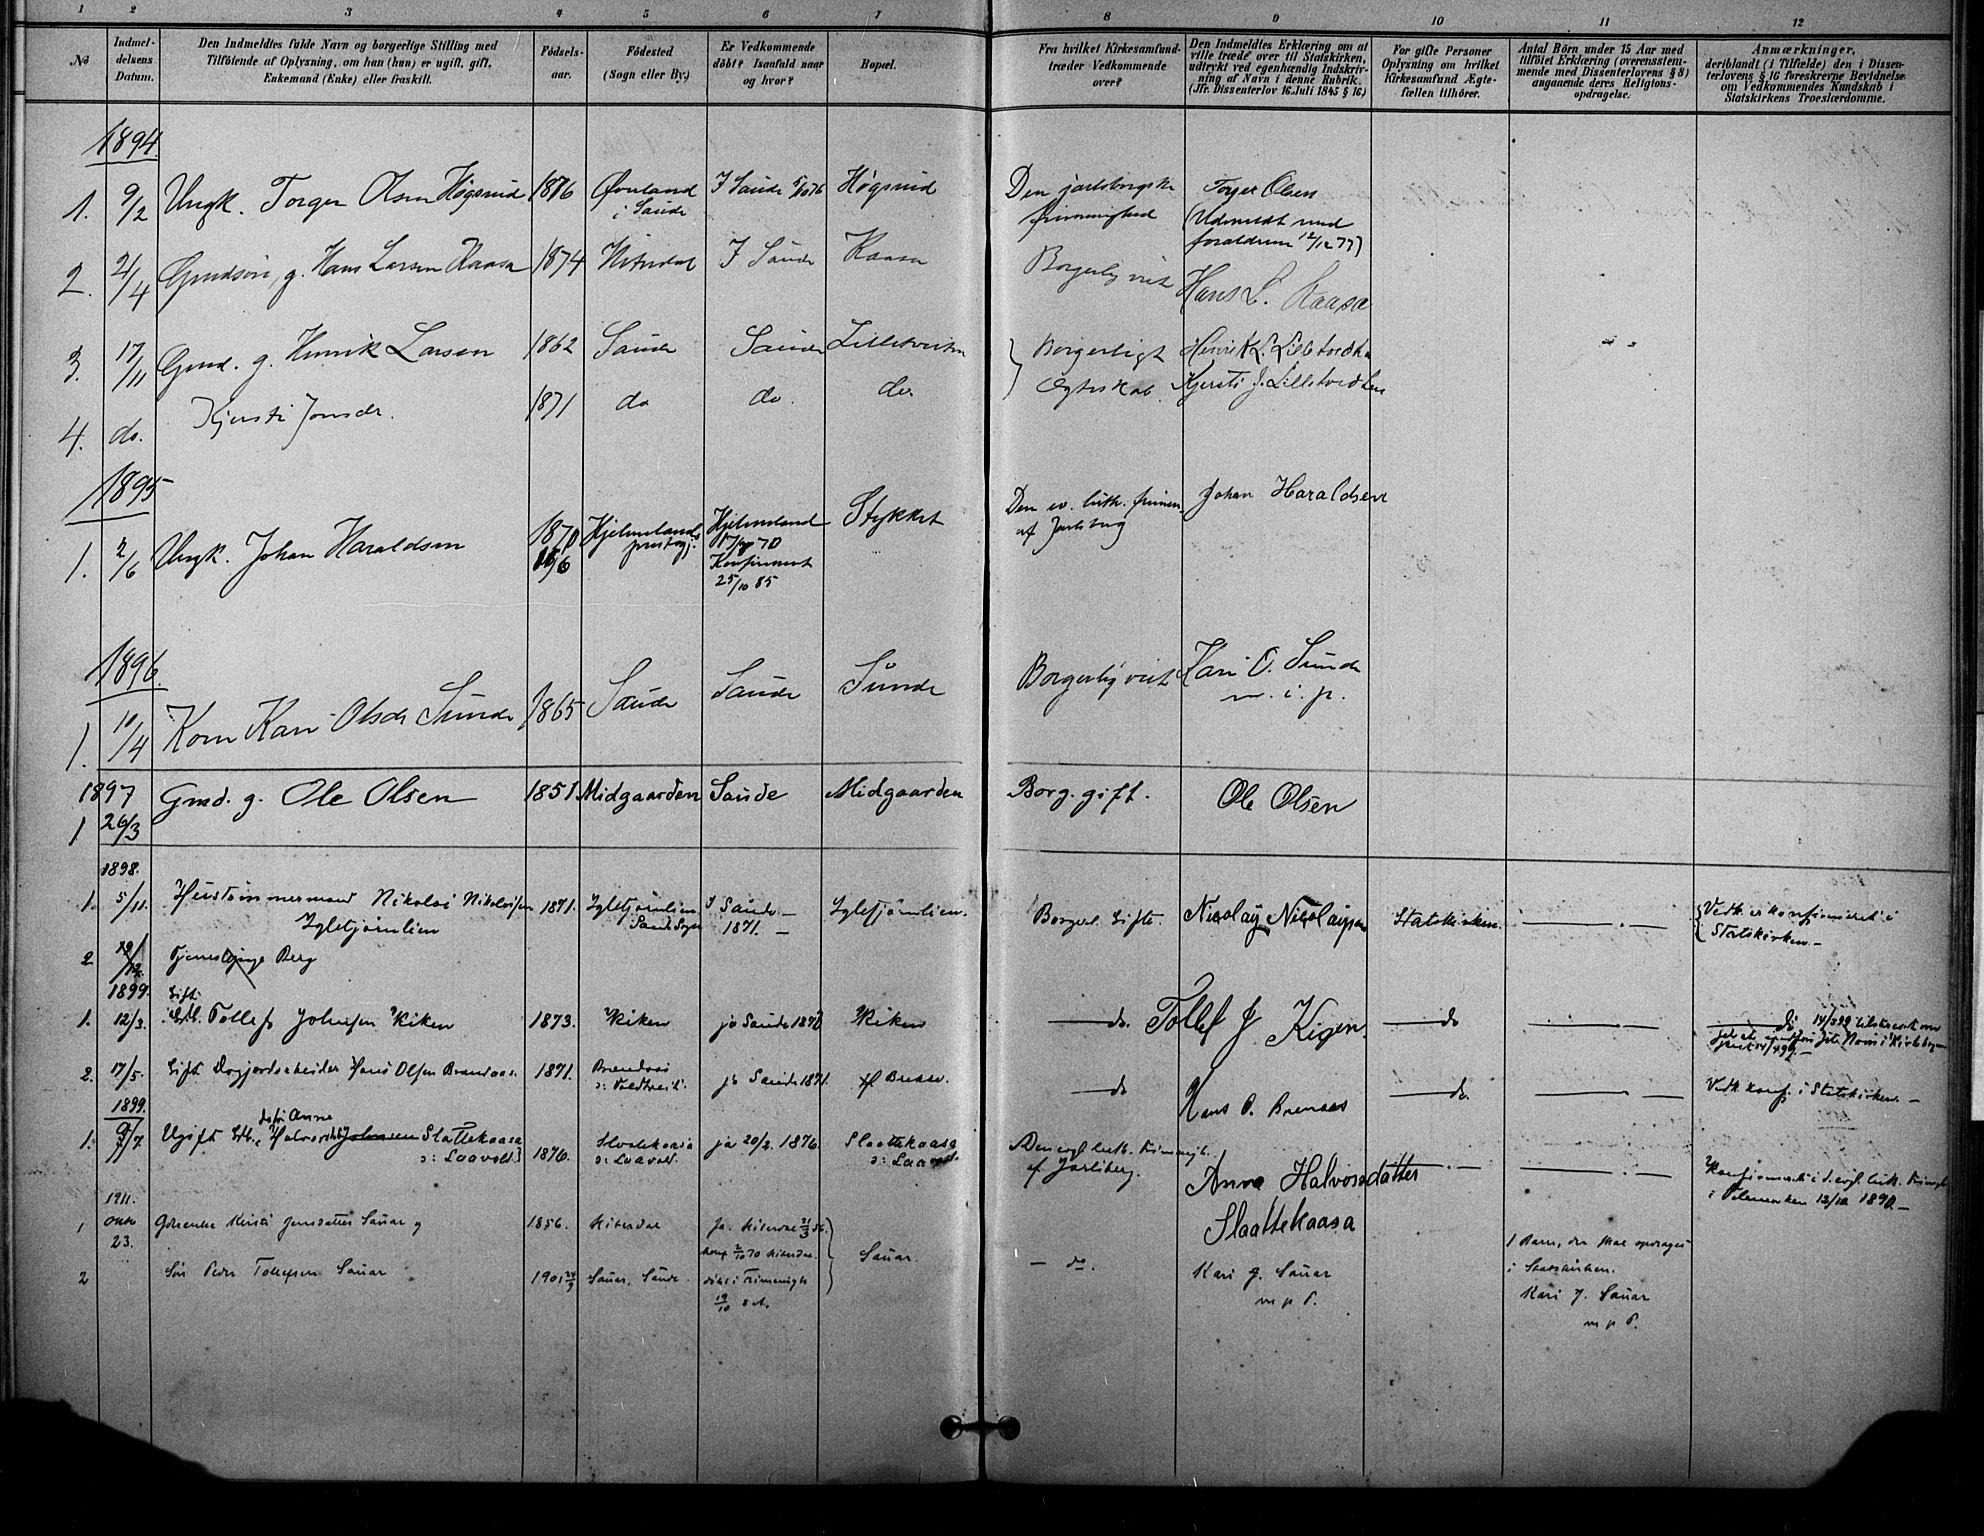 SAKO, Sauherad kirkebøker, F/Fa/L0009: Ministerialbok nr. I 9, 1887-1912, s. 221